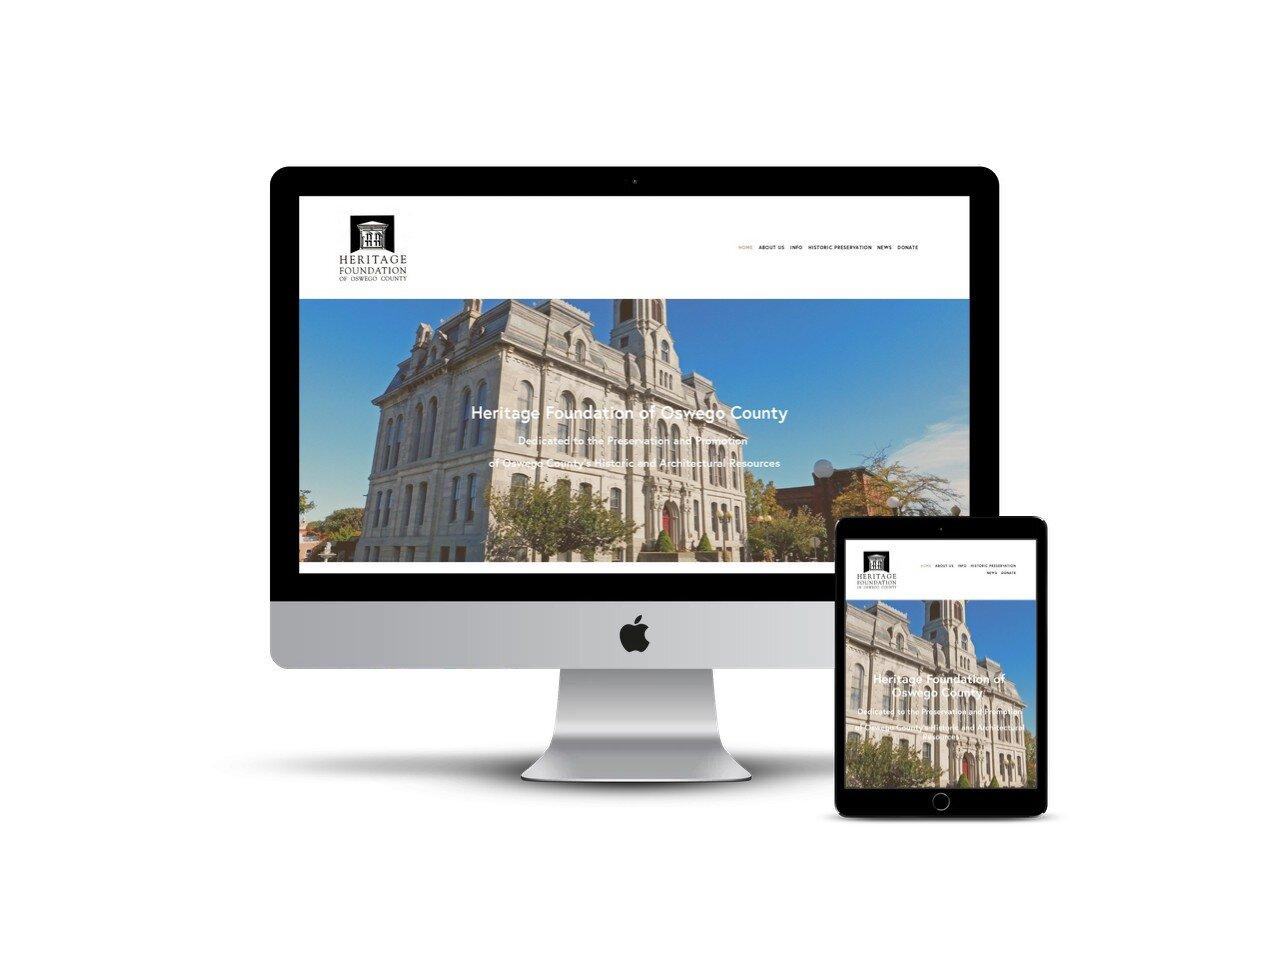 Website Design Services Fulton, NY